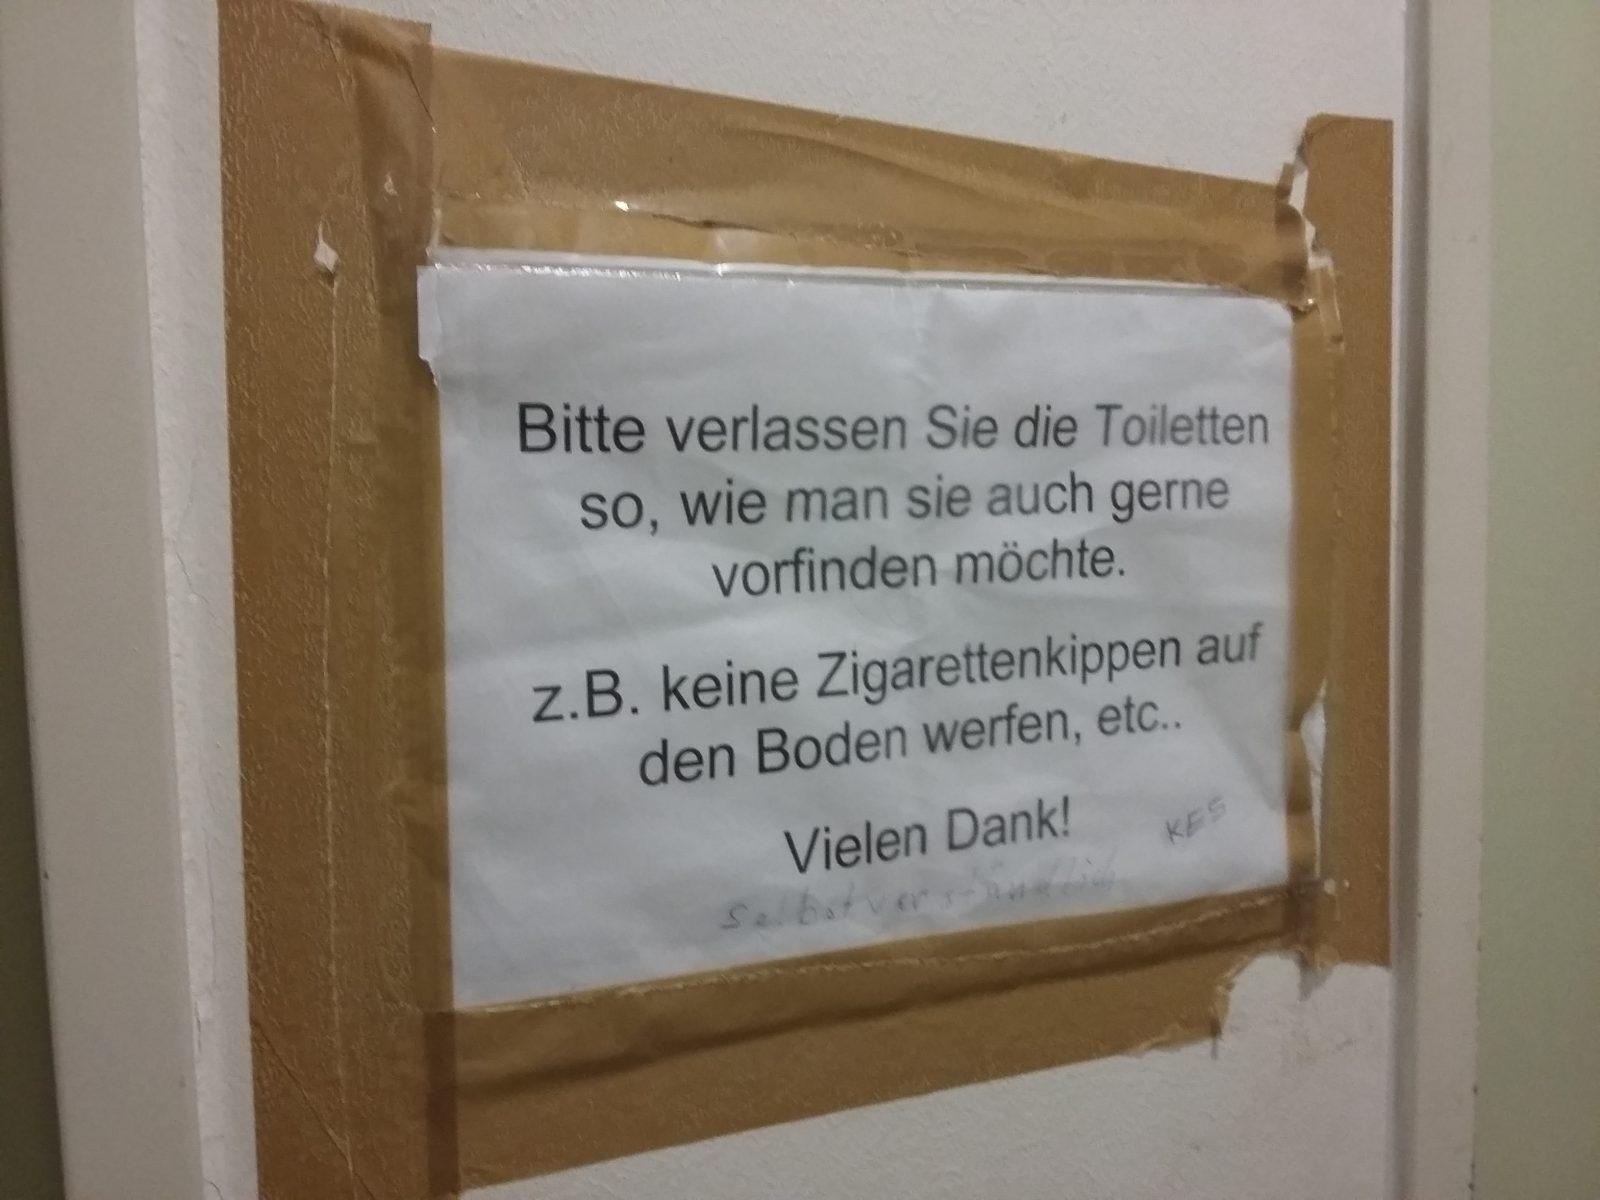 Servicepioniere_Servicekomplizen_Orte_des_Grauens_Armin_Nagel (30)